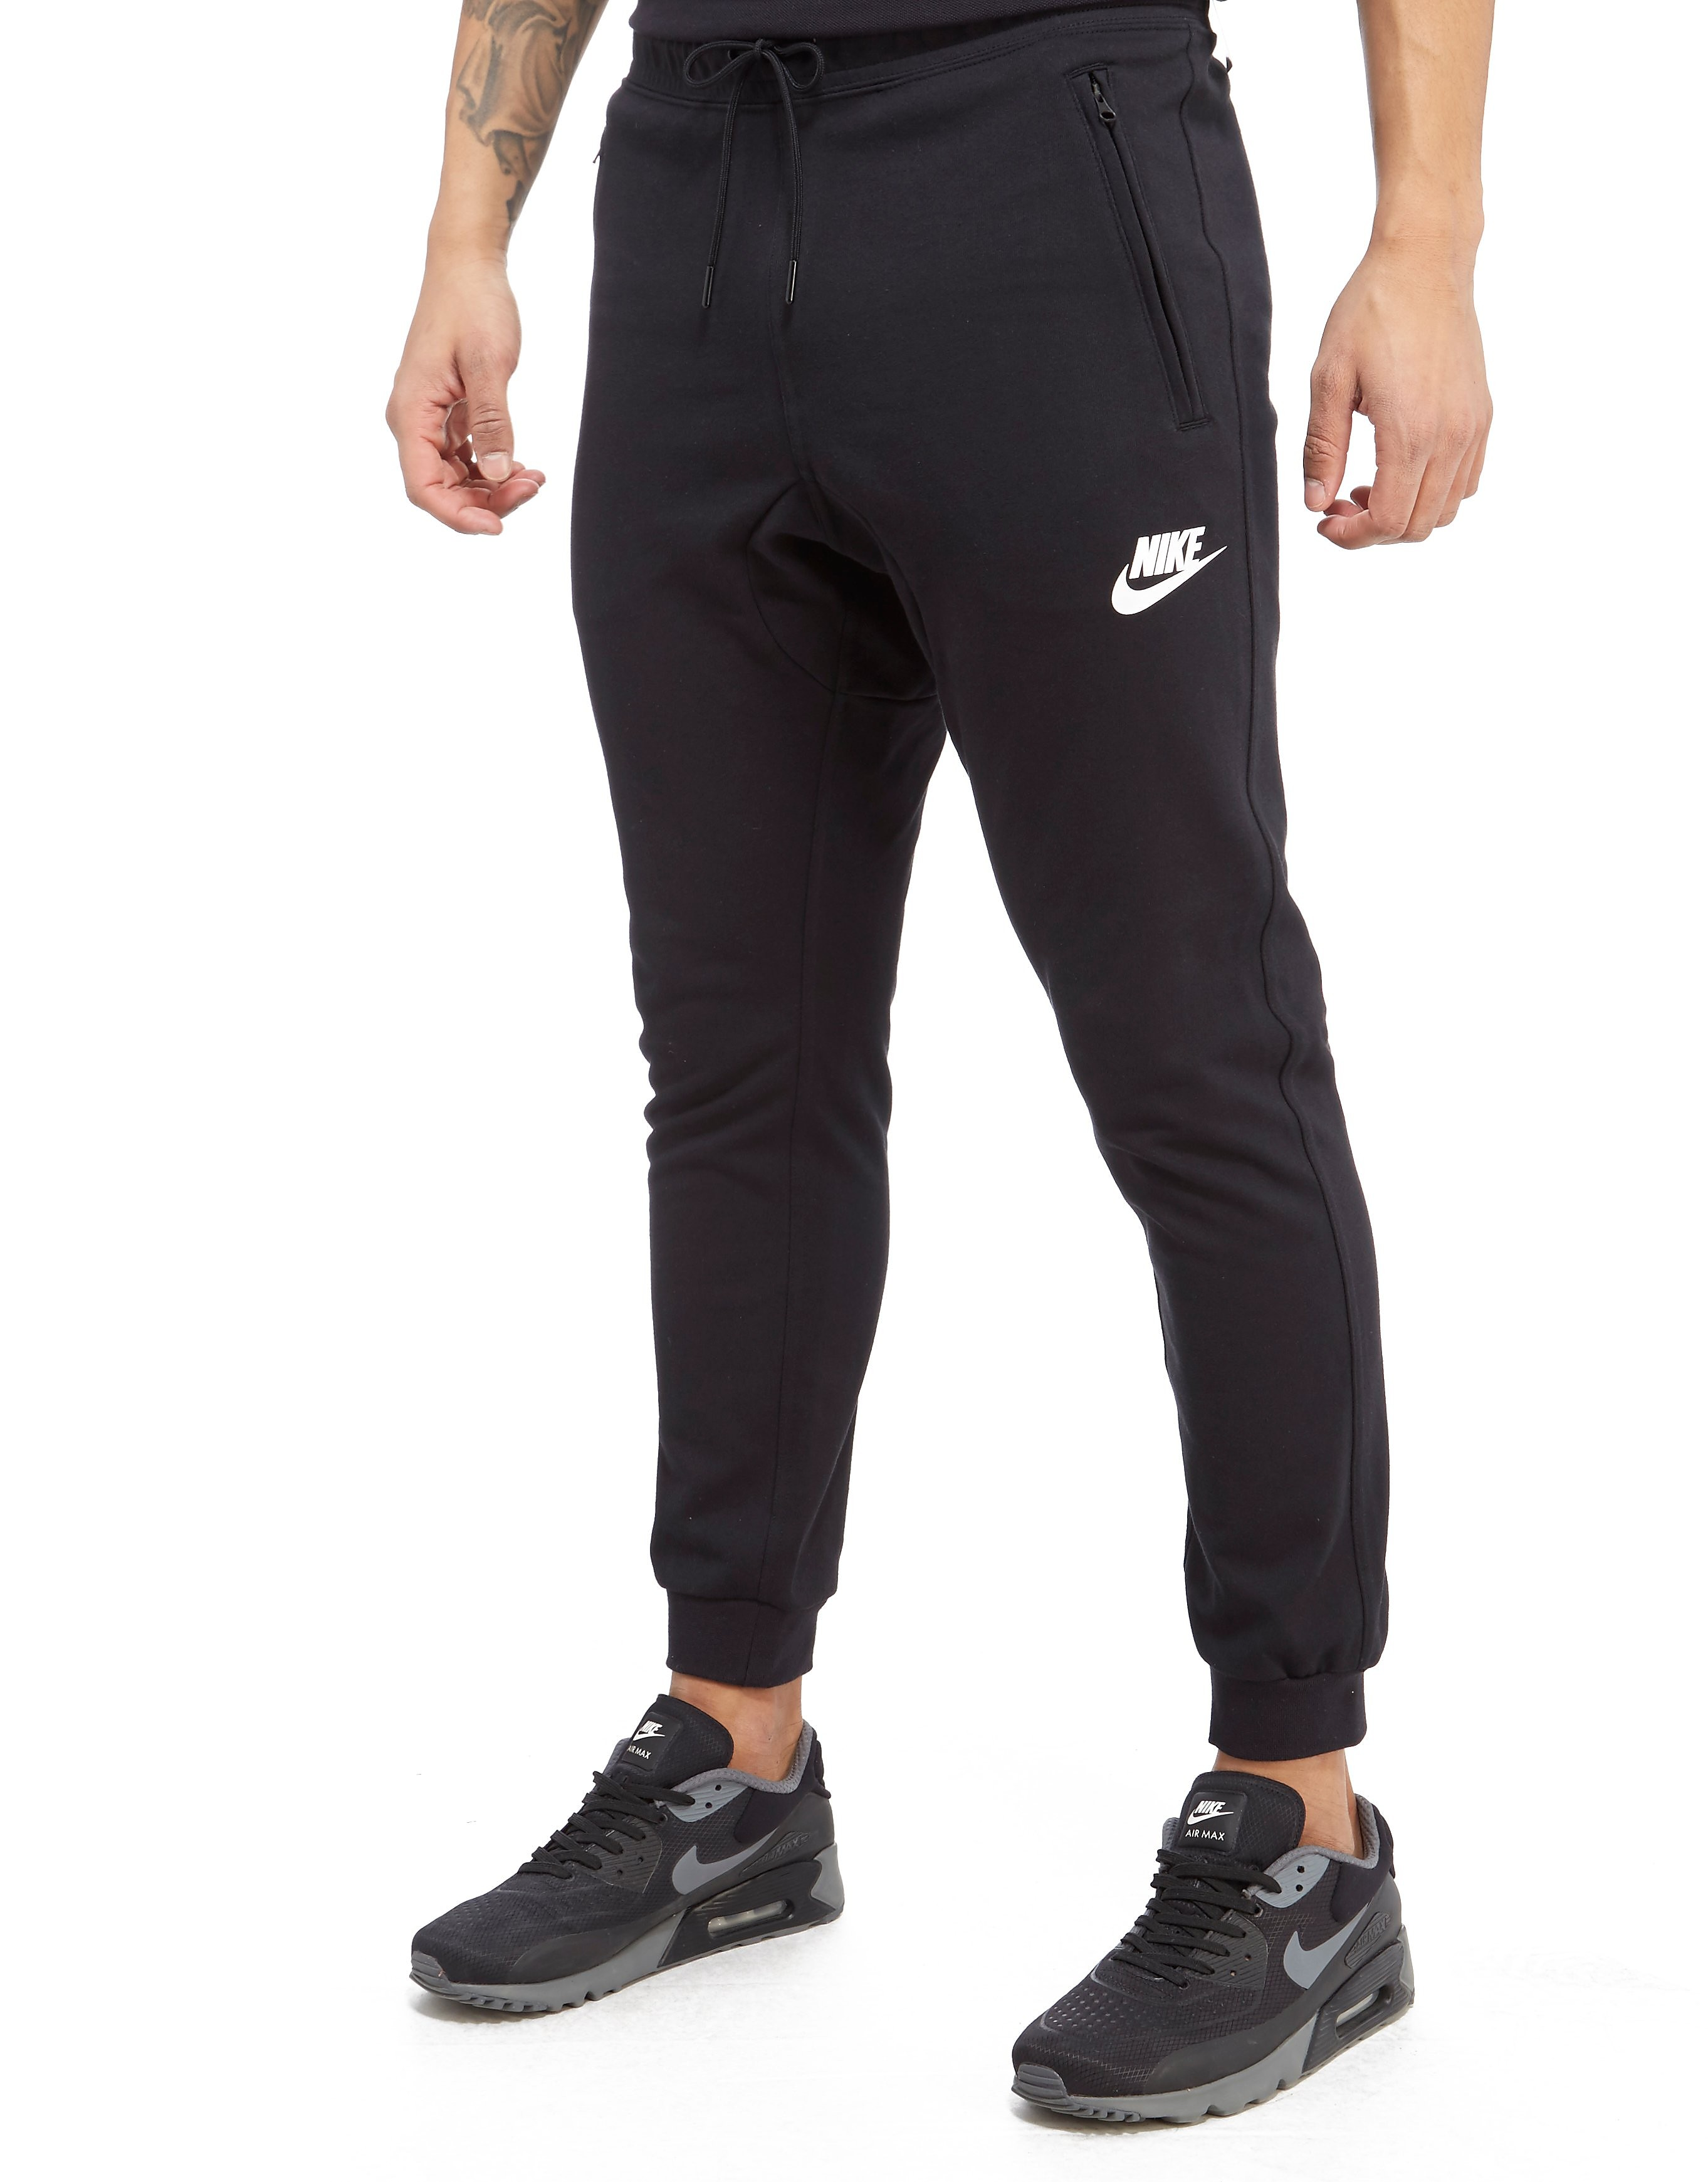 Nike Advance Joggers